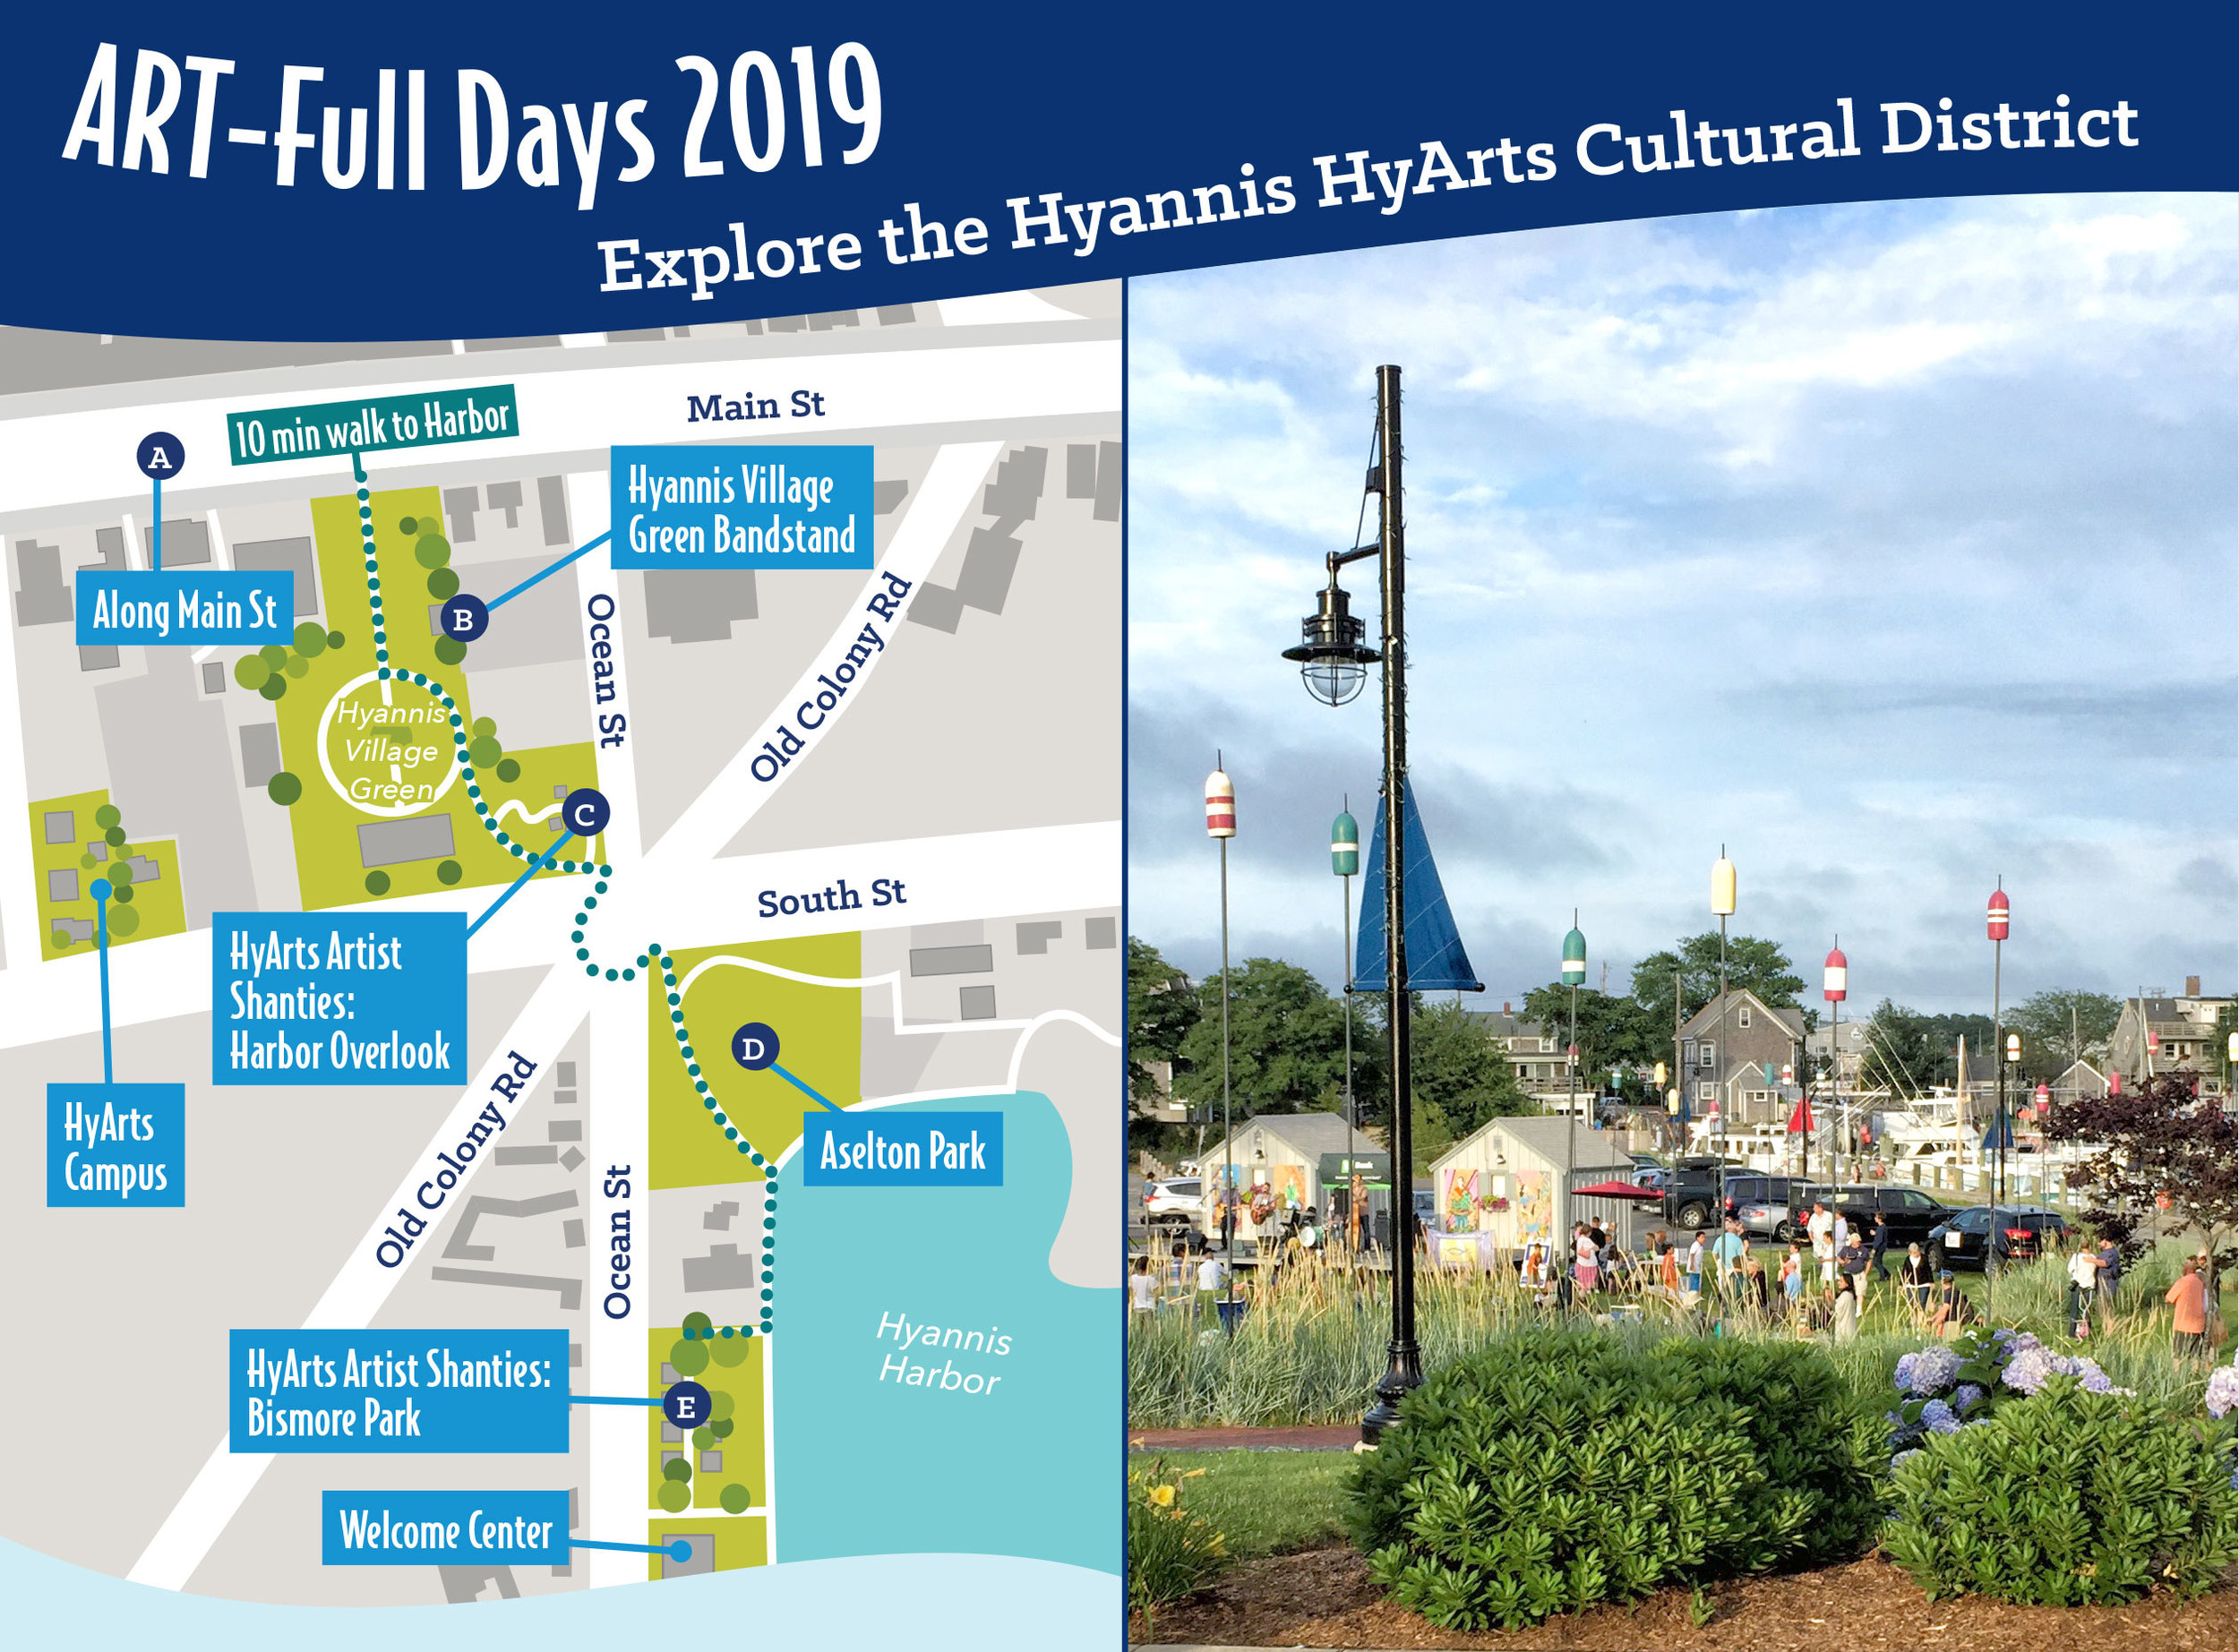 2019-Hyannis-HyArts-event-calendar-1.jpg